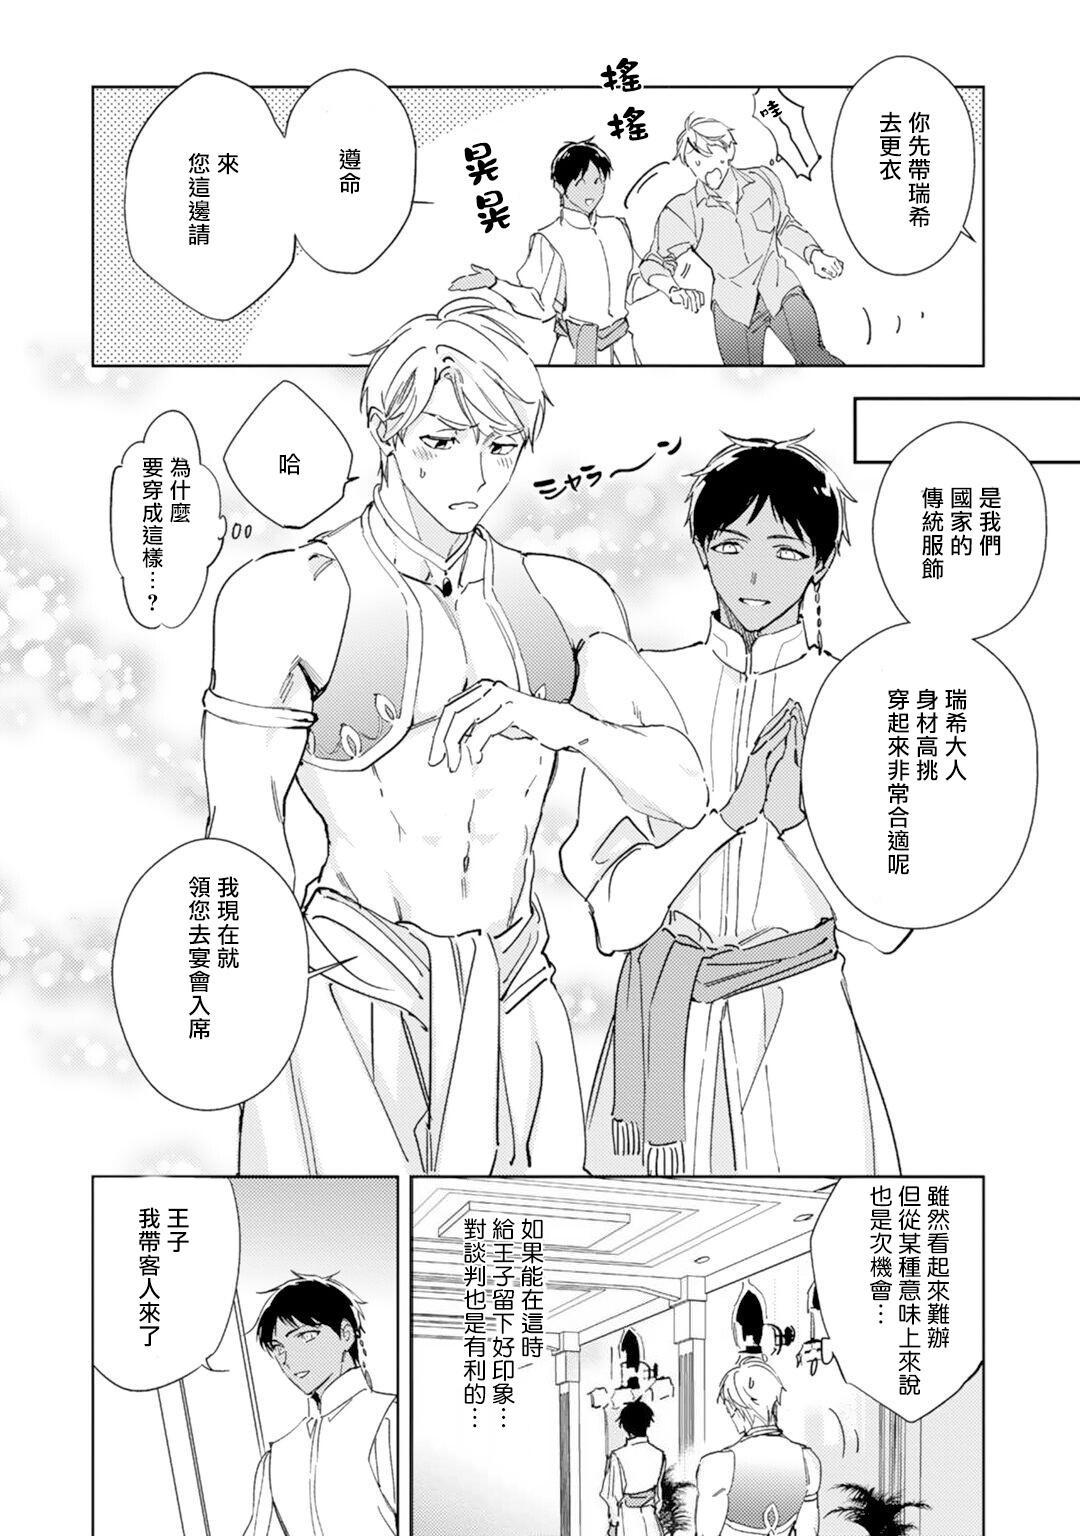 Amber Vanilla no Hanayome | 琥珀香草的新娘 Ch. 1-3 10